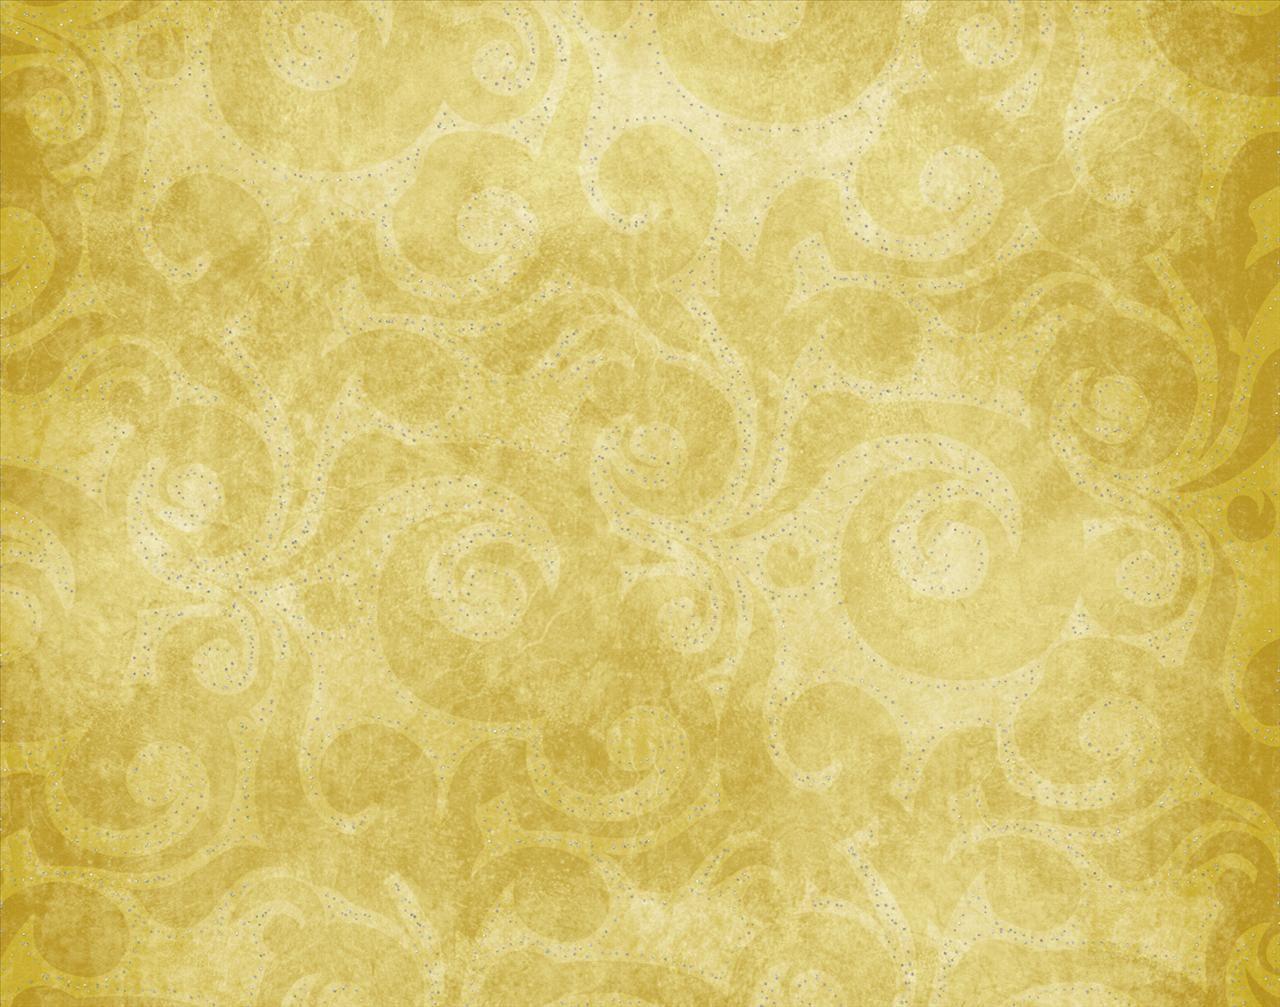 Pin by chris du preez on goudkleurig pinterest free ppt backgrounds for powerpoint templates glowing golden powerpoint free backgrounds high quality toneelgroepblik Choice Image